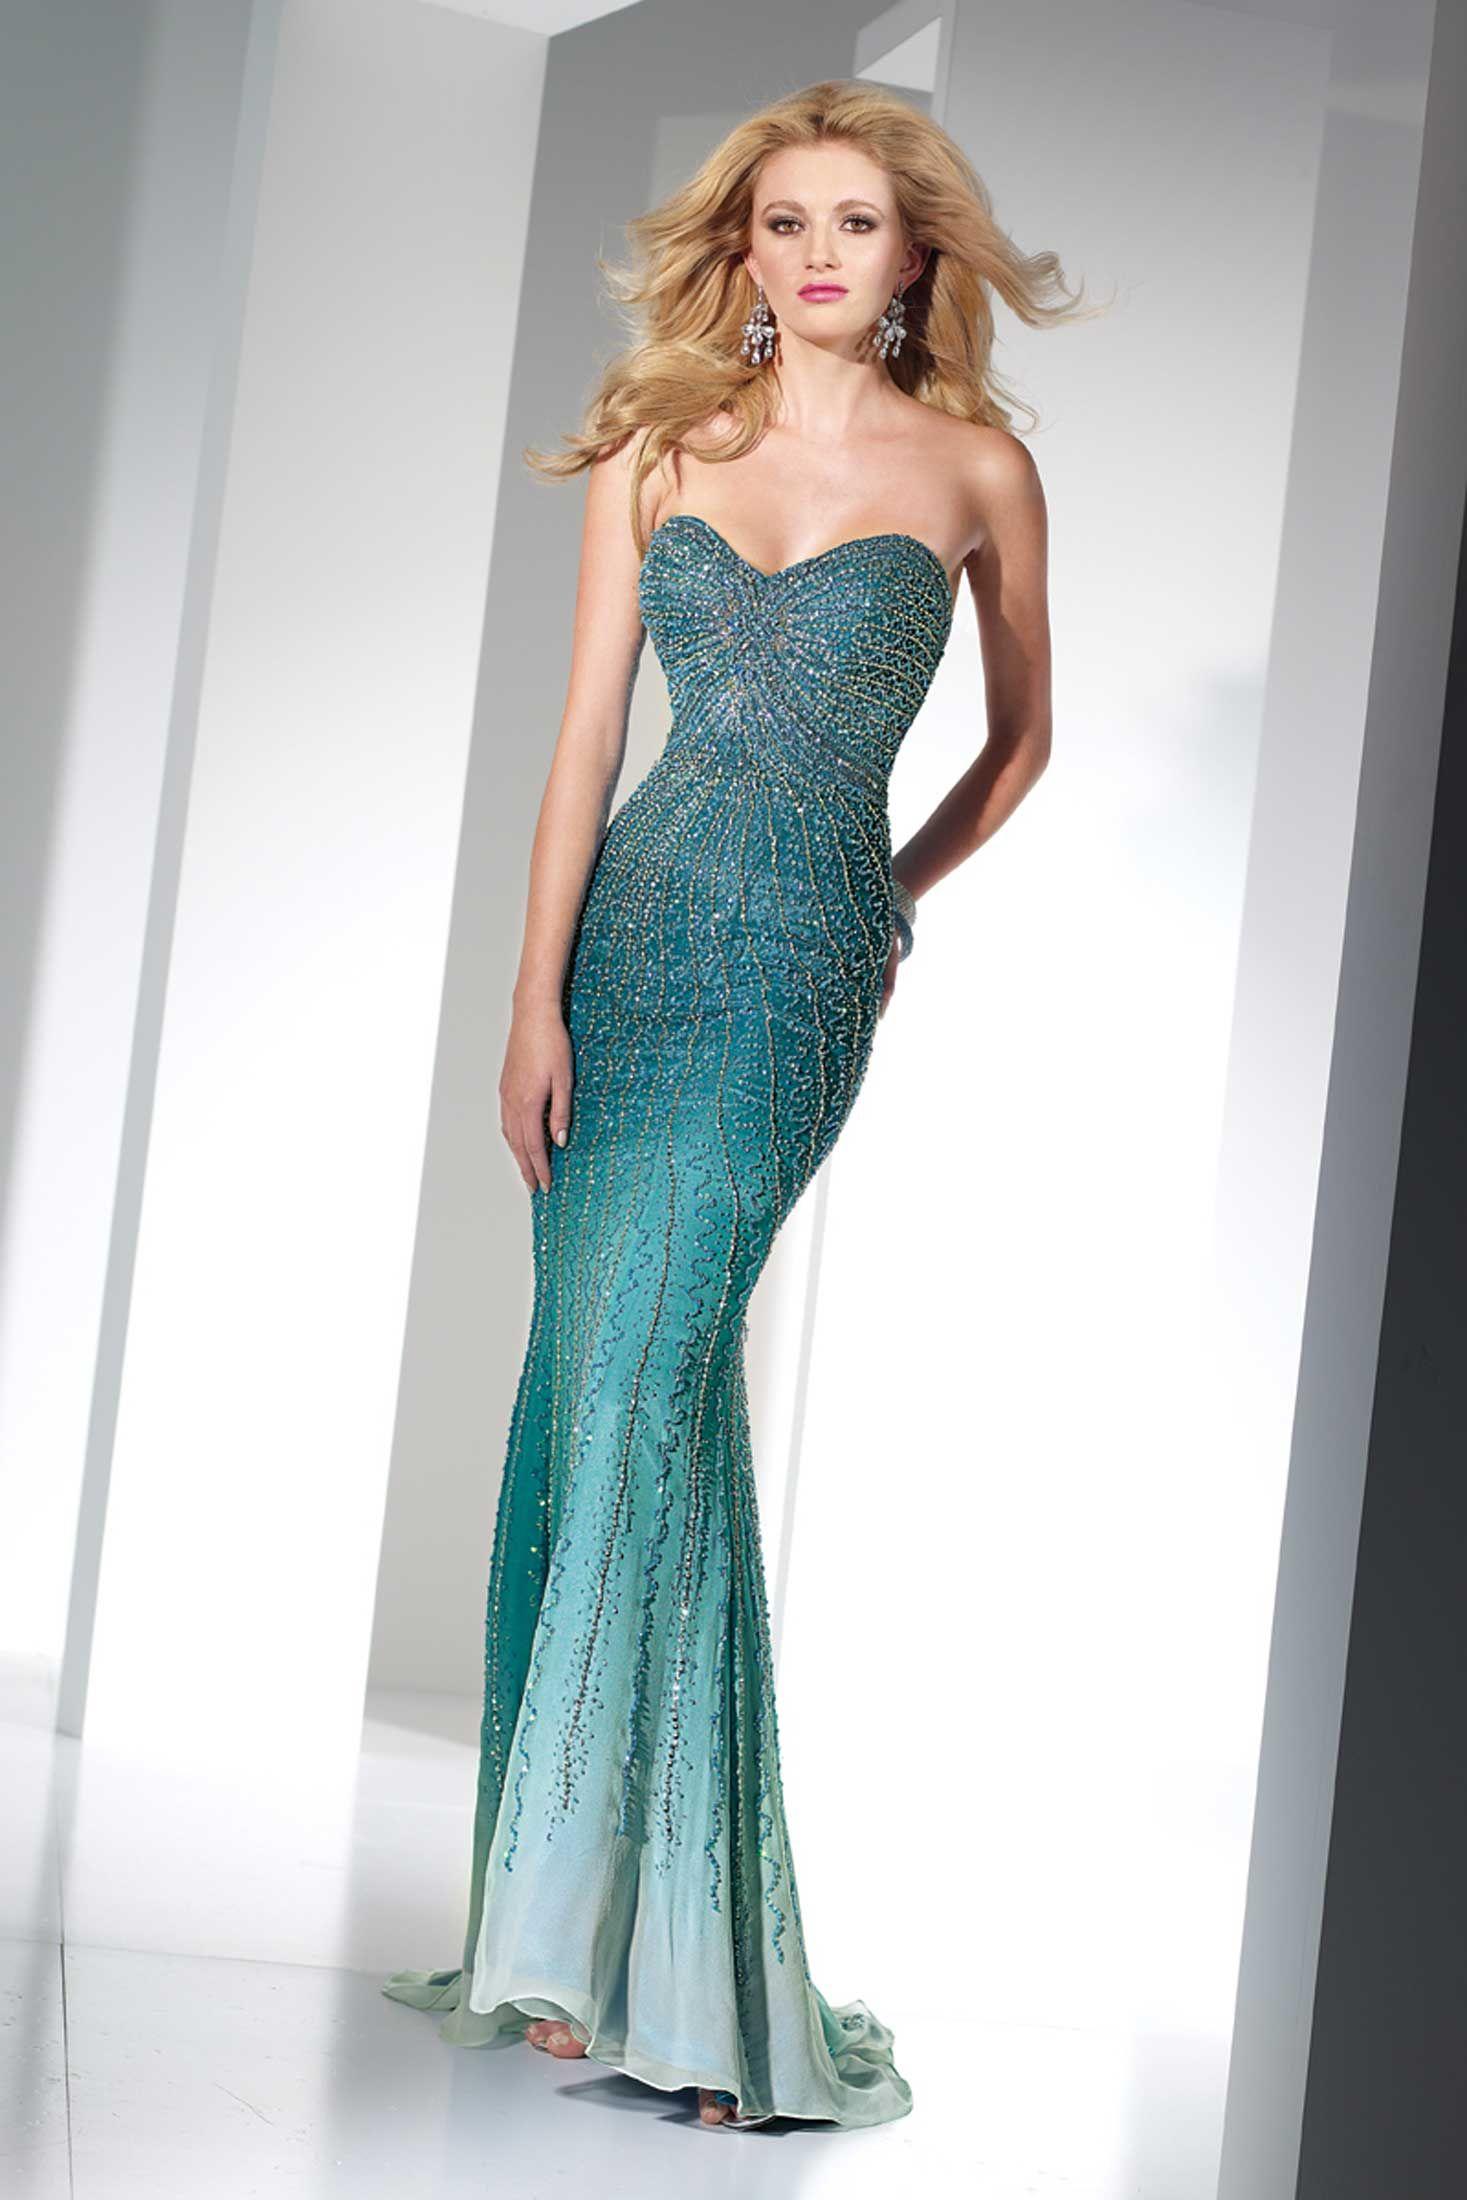 Beaded blue/green dress. Gorgeous. | Interesting enough | Pinterest ...